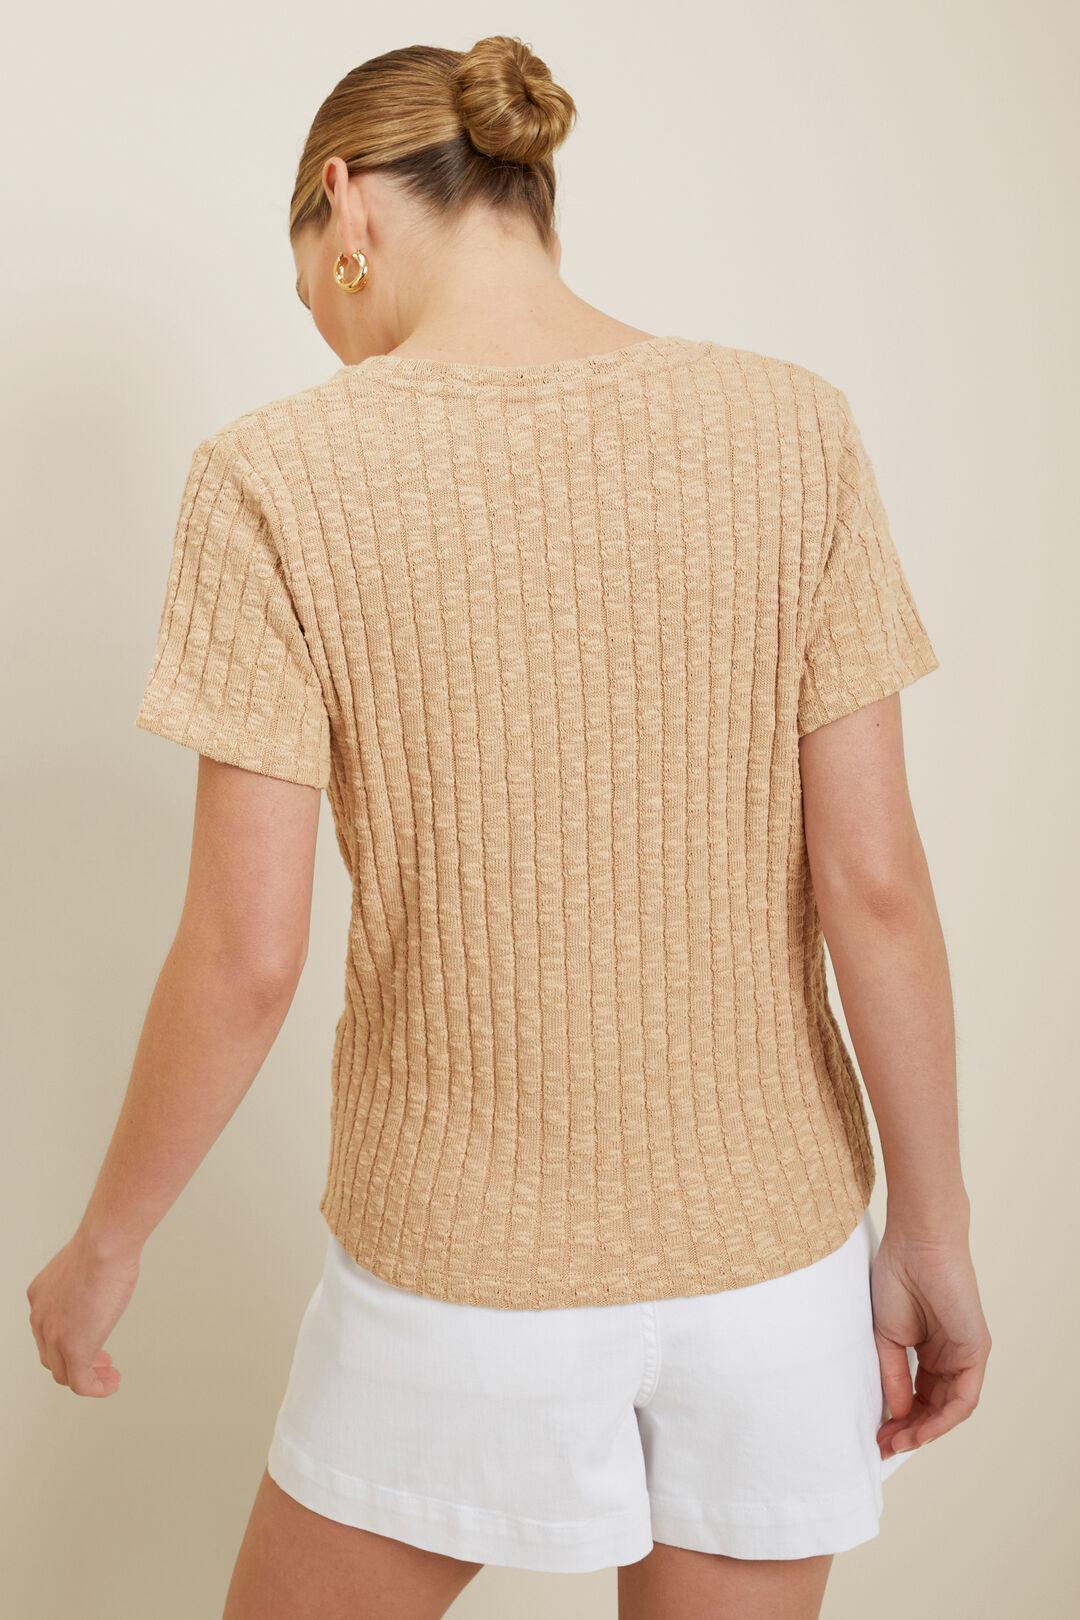 Textured U Neck Tee  Neutral Sand  hi-res